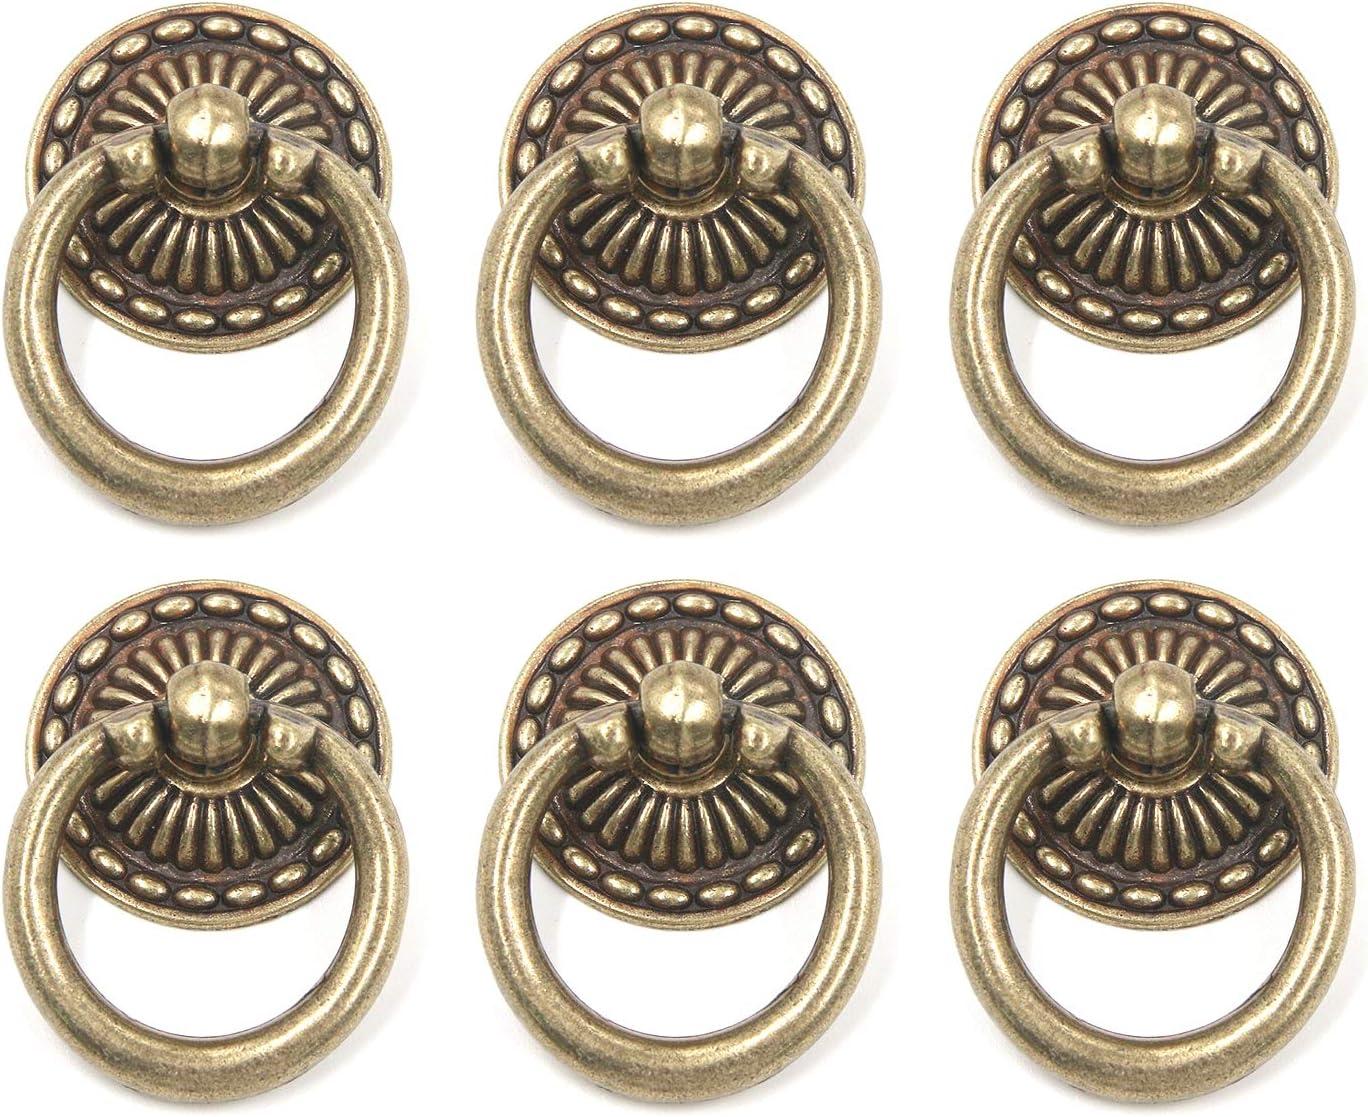 MTMTOOL Vintage Bronze Knobs Pulls Handles Zinc Alloy Antique Ring Drawer Pulls Handle Furniture Decorative Hardware Cabinet Dresser Pull Ring with Screws Pack of 6